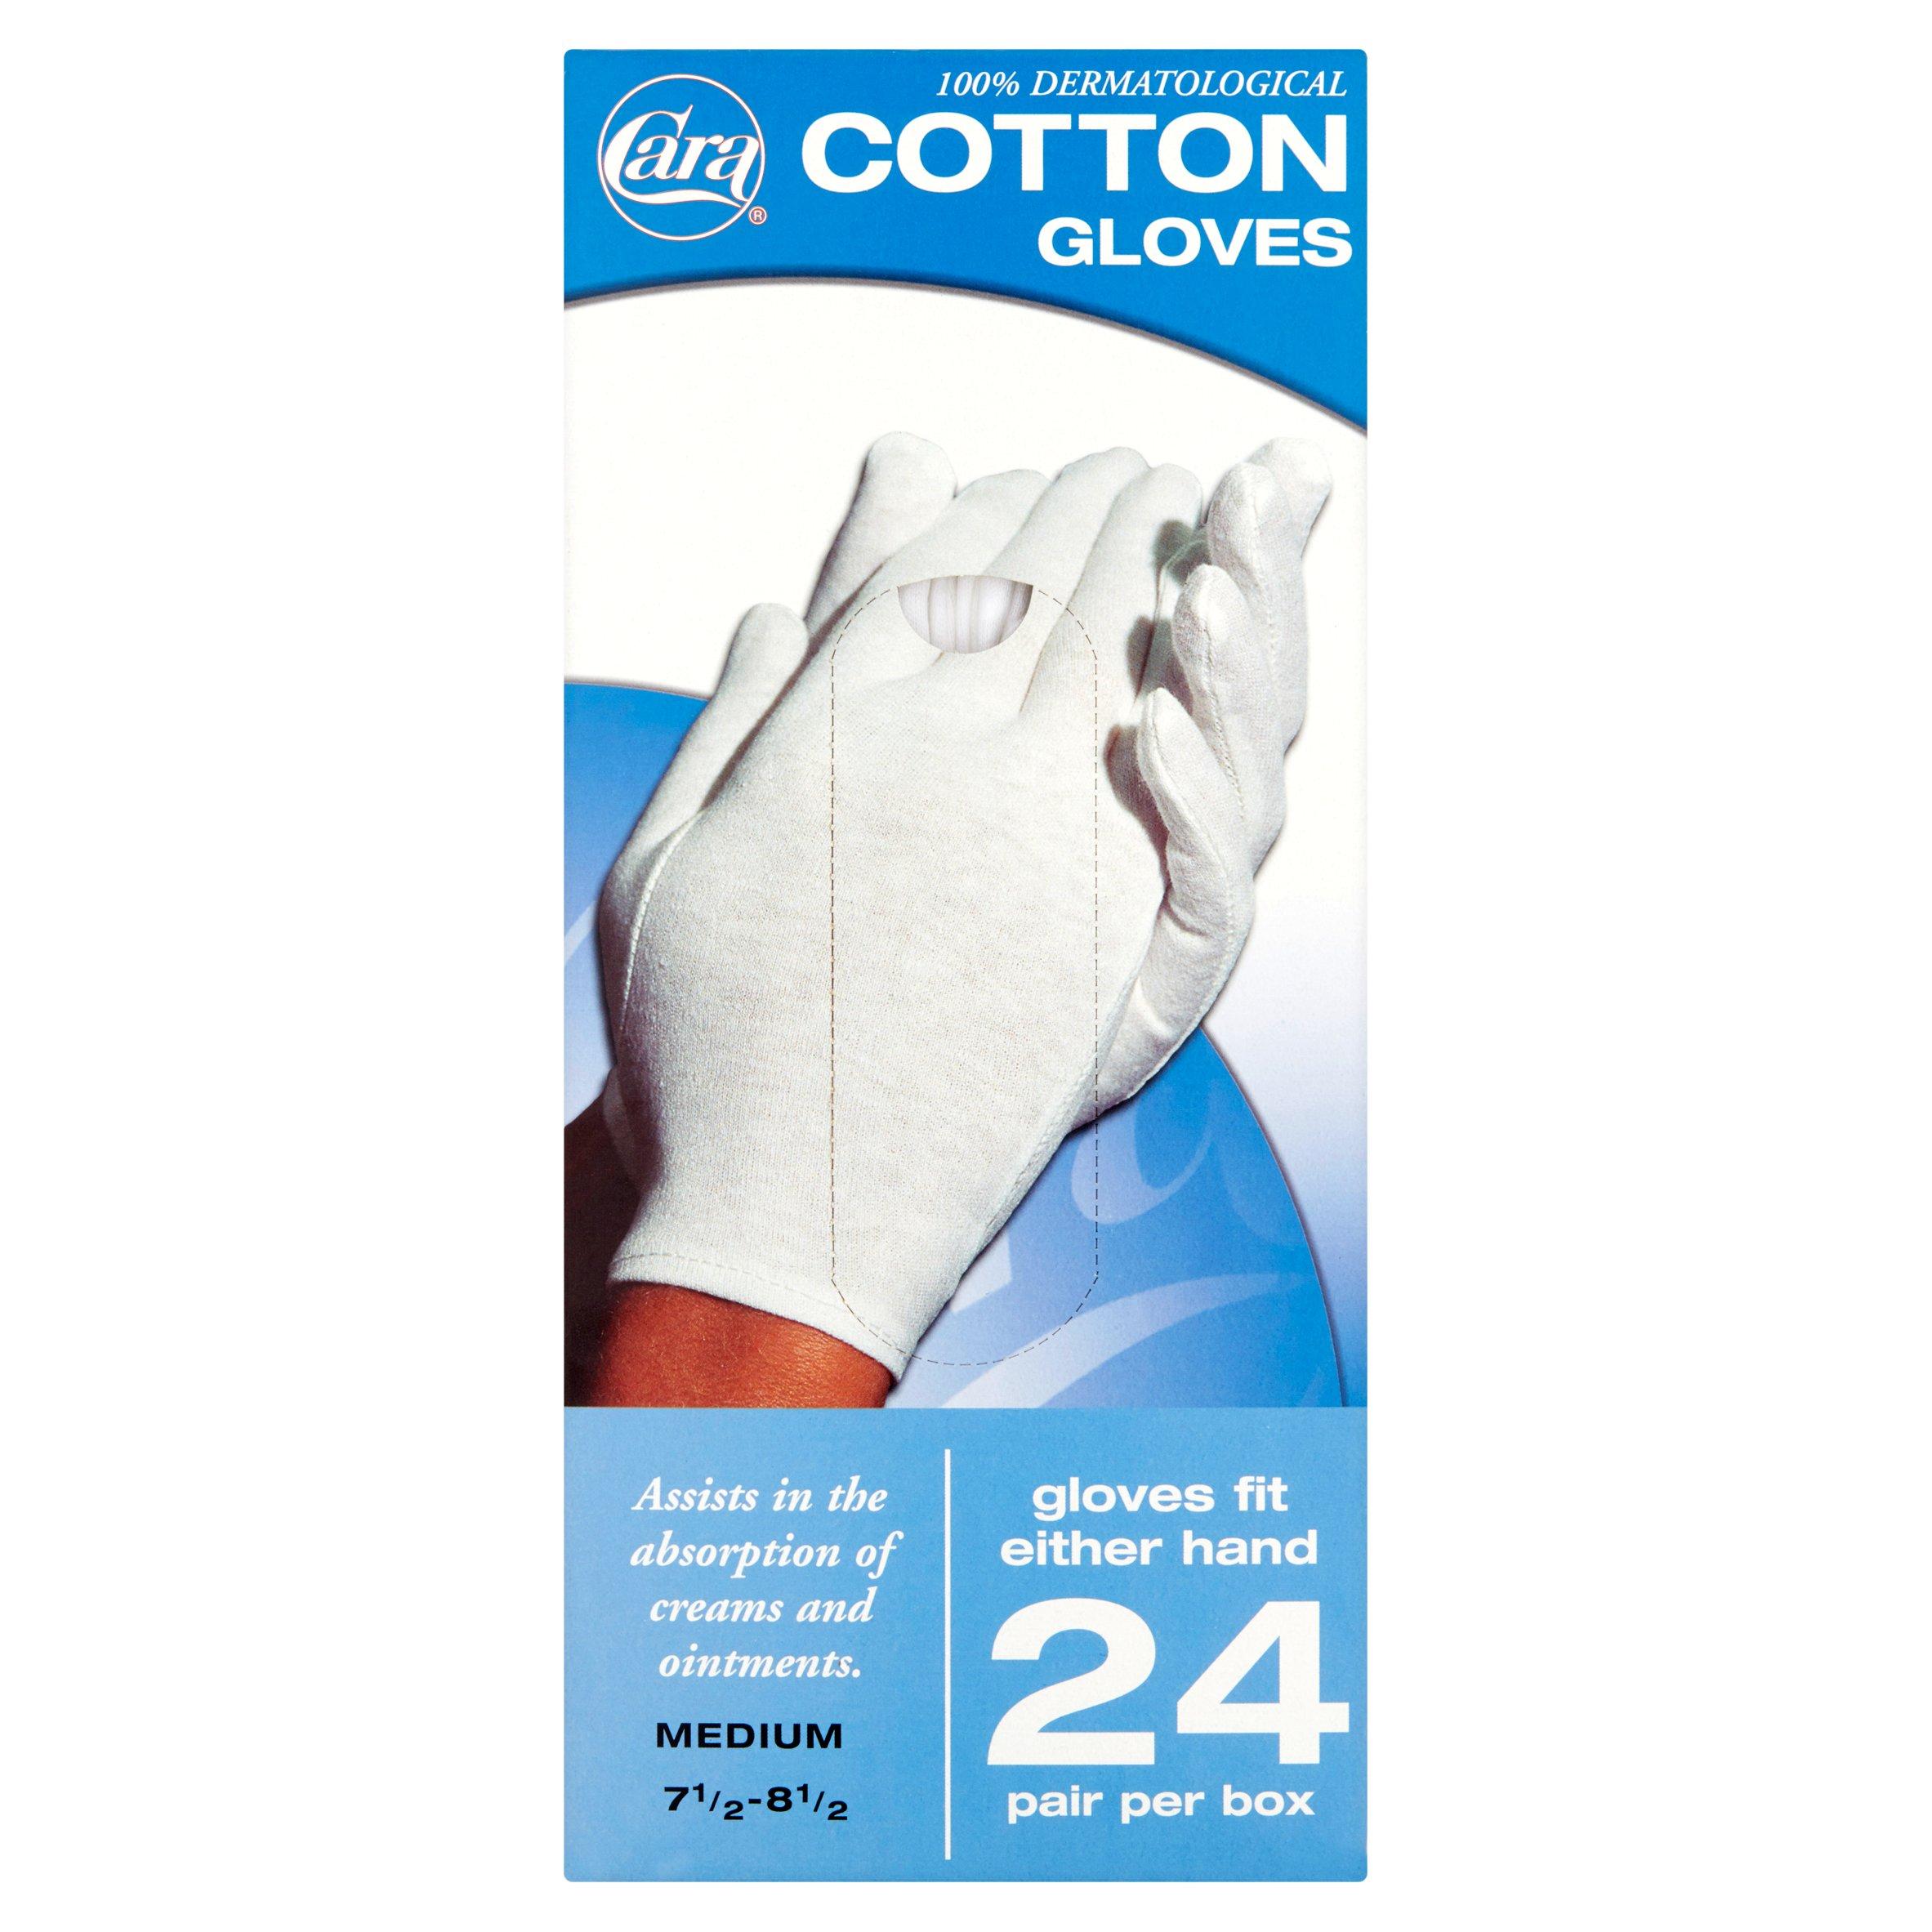 Cara Disposable Cotton Therapy Gloves, 24 Pair - Medium